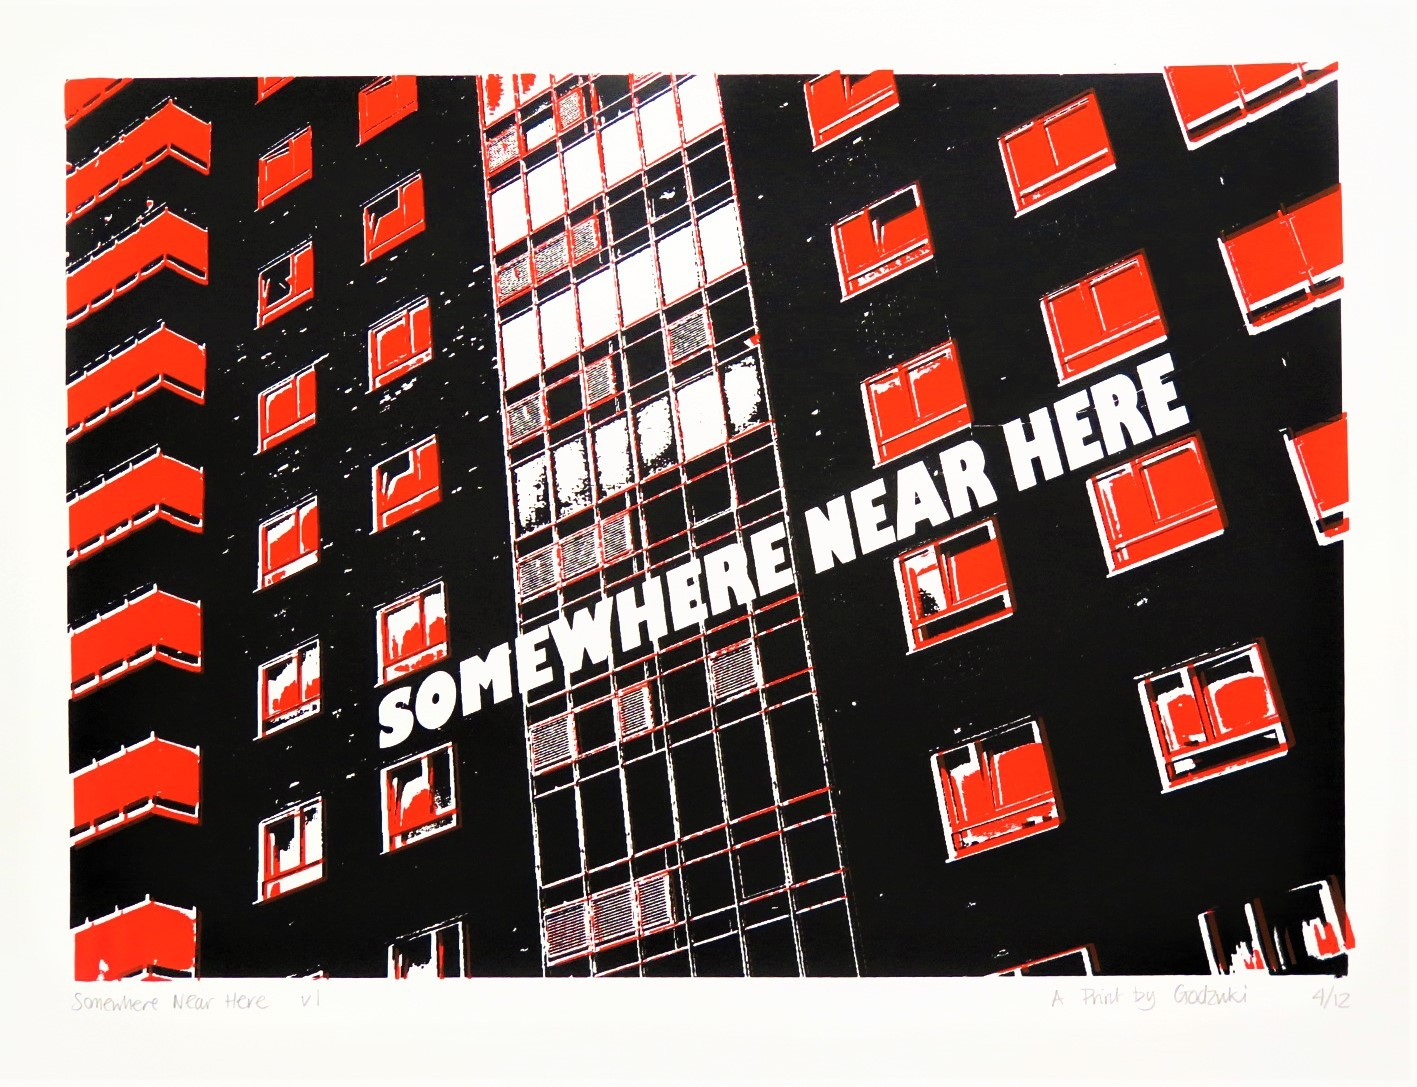 Godzuki, Somewhere Near Here, screenprint, Brighton, brutalist architecture